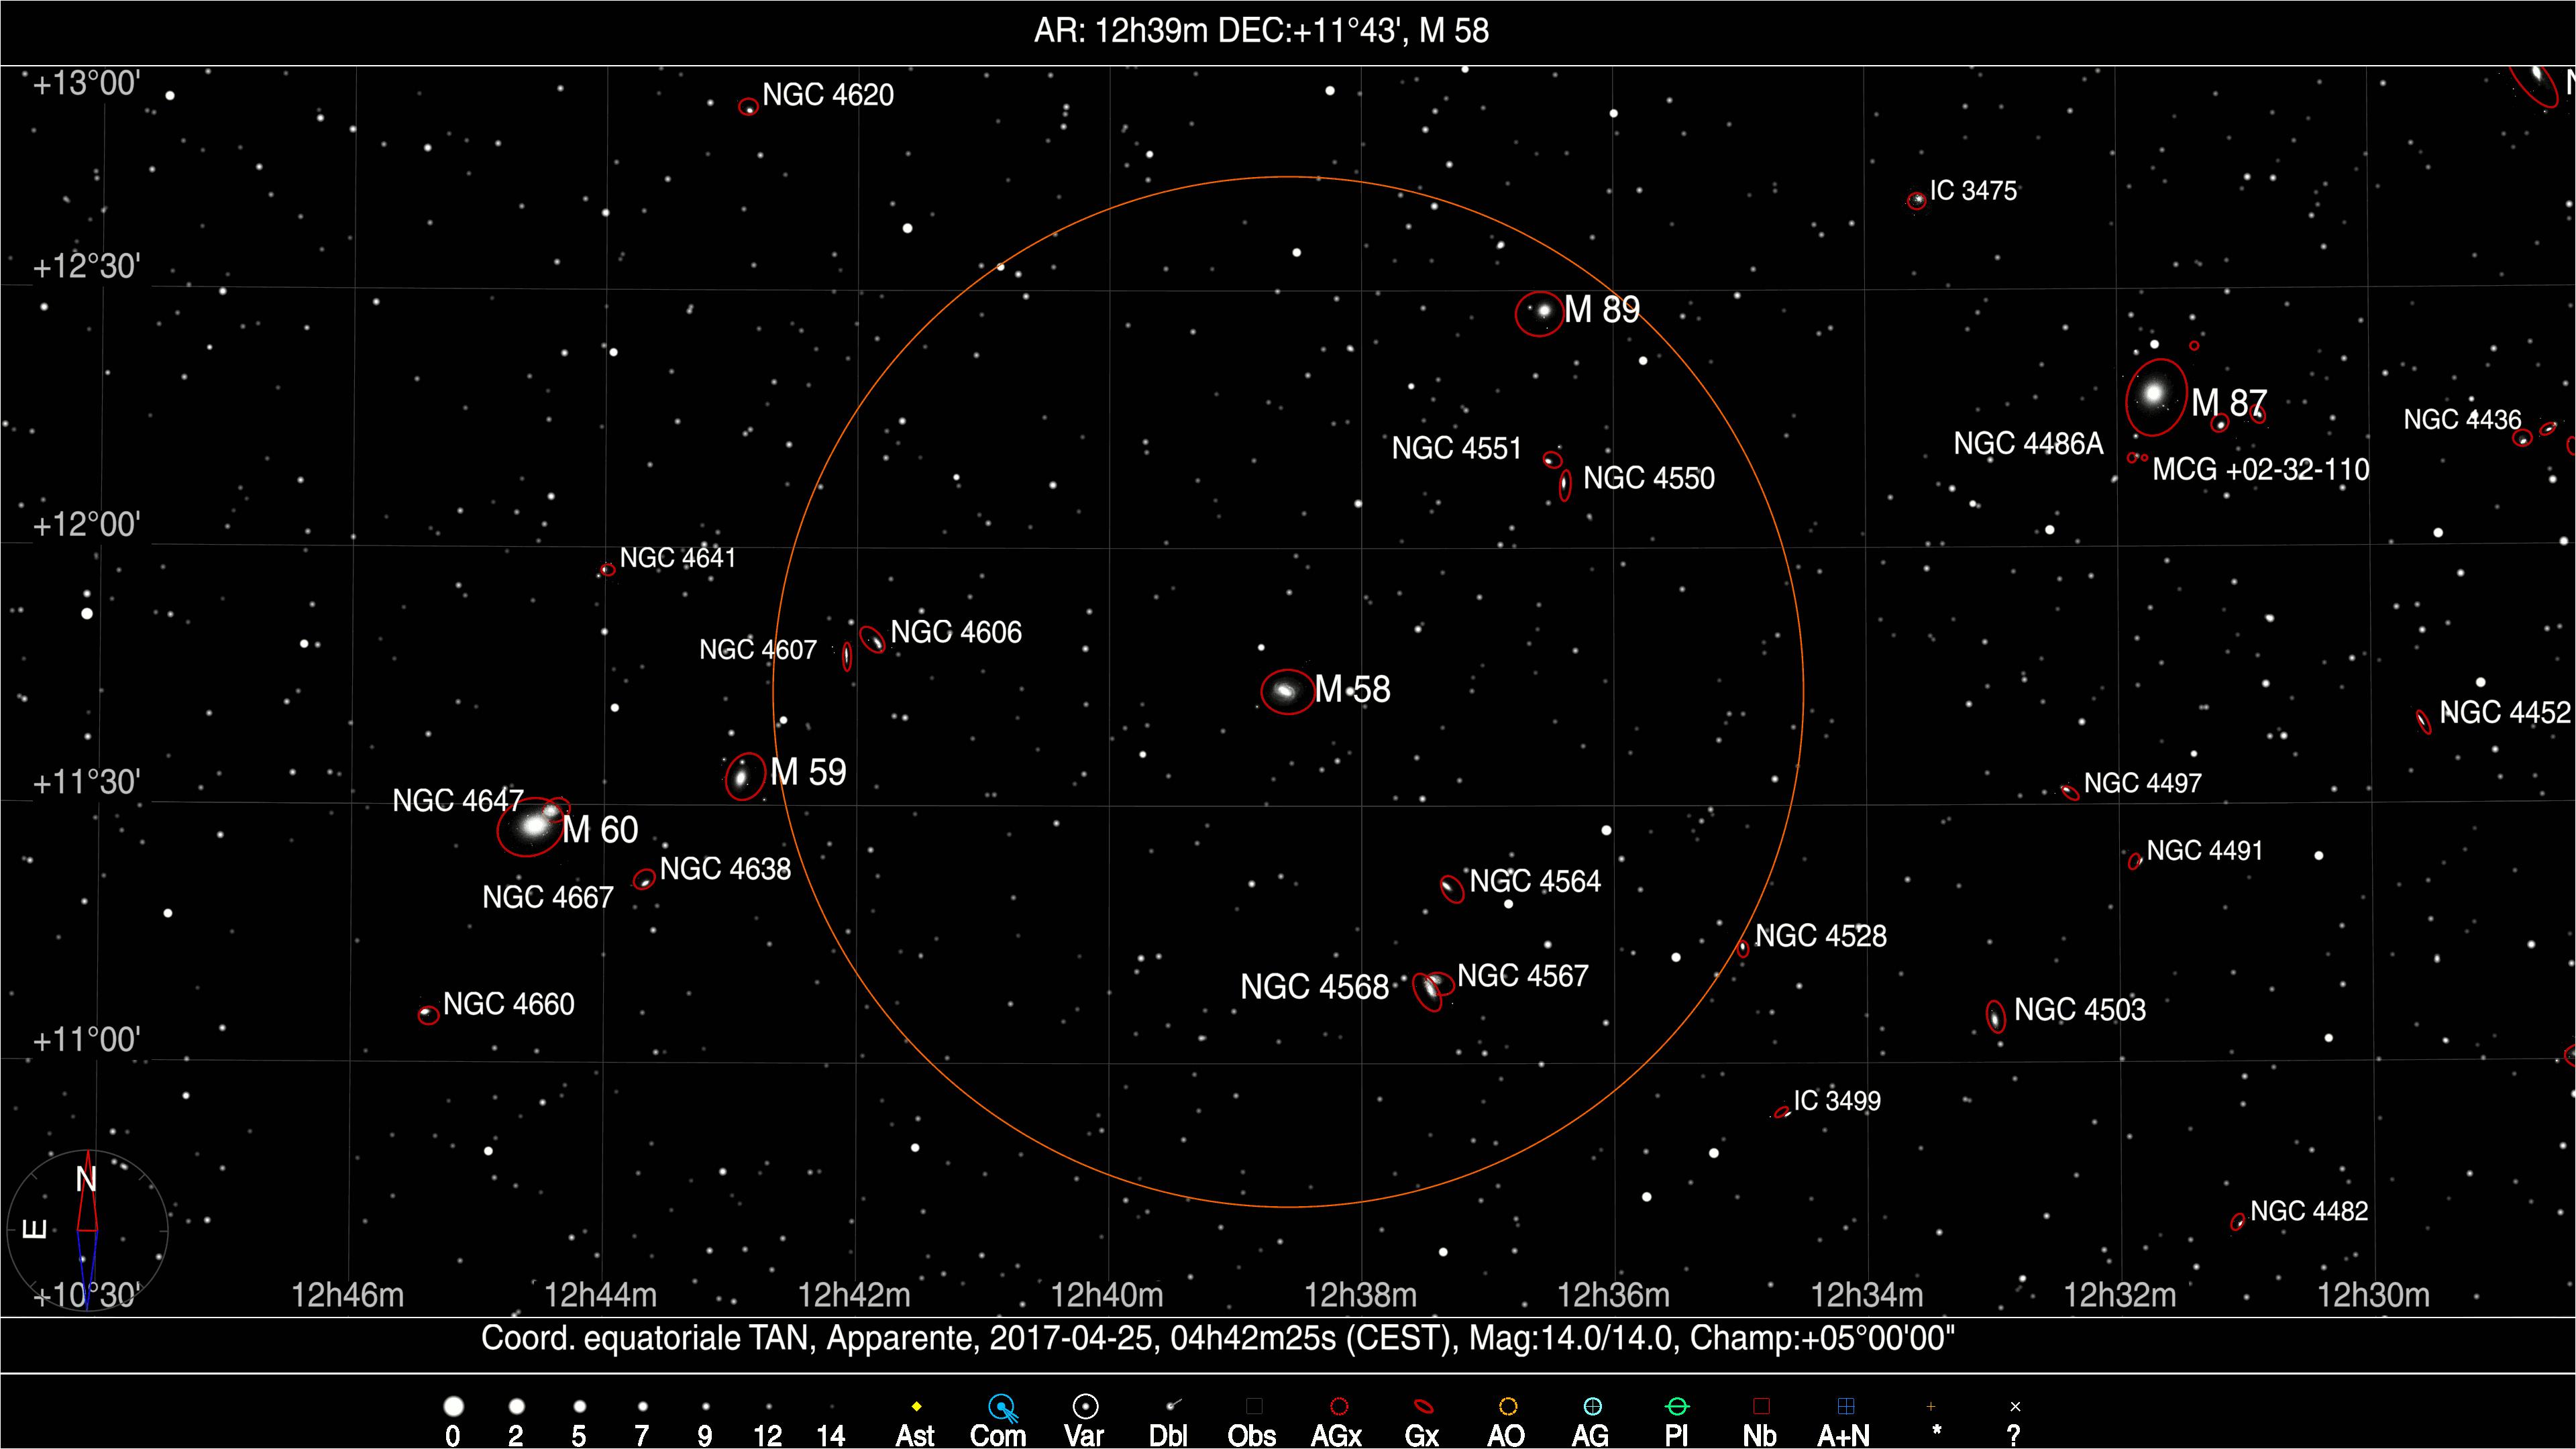 M58_5